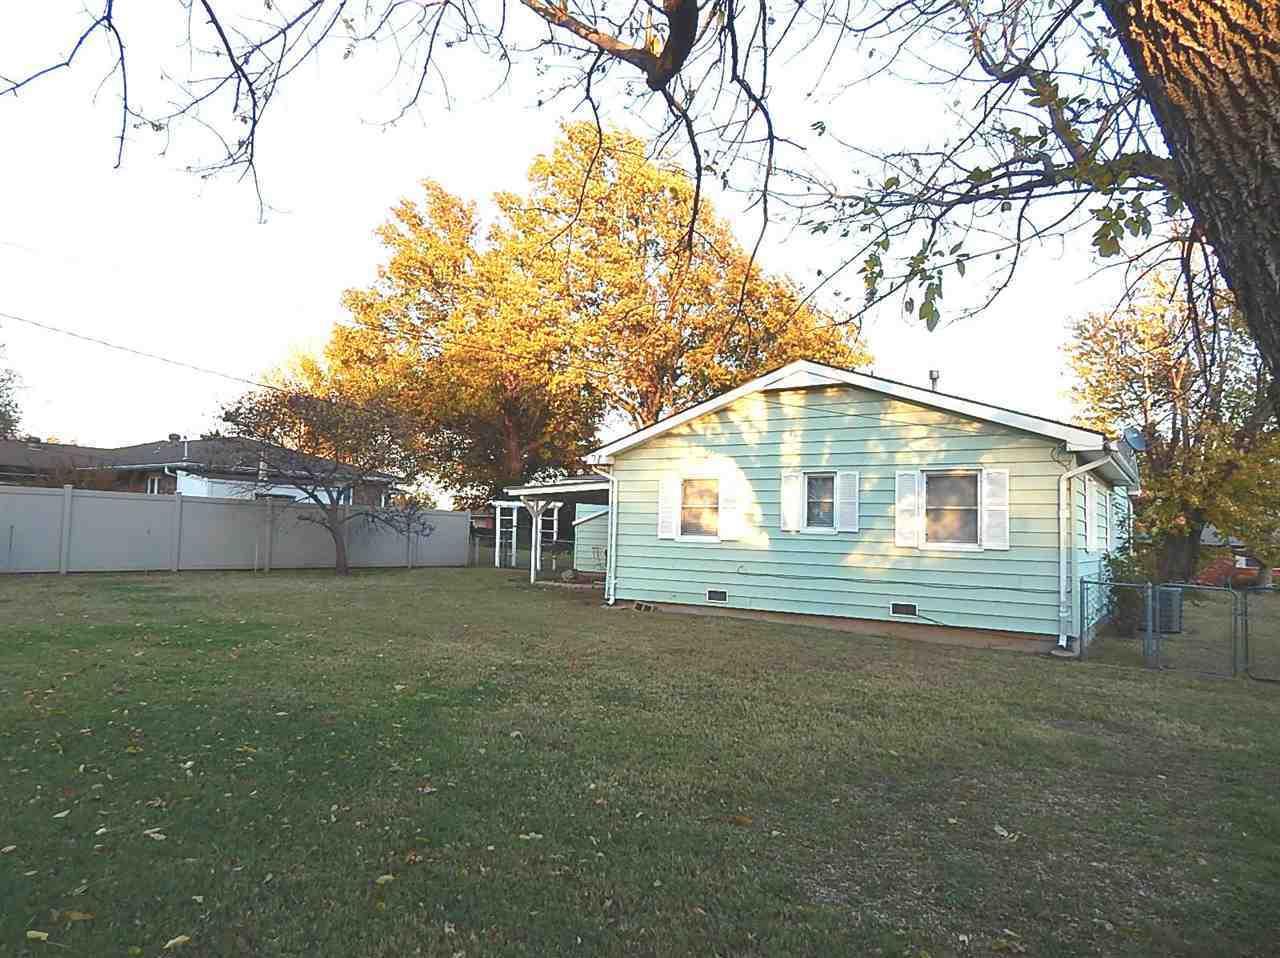 Sold Intraoffice W/MLS | 2226 Garden Ponca City, OK 74601 12